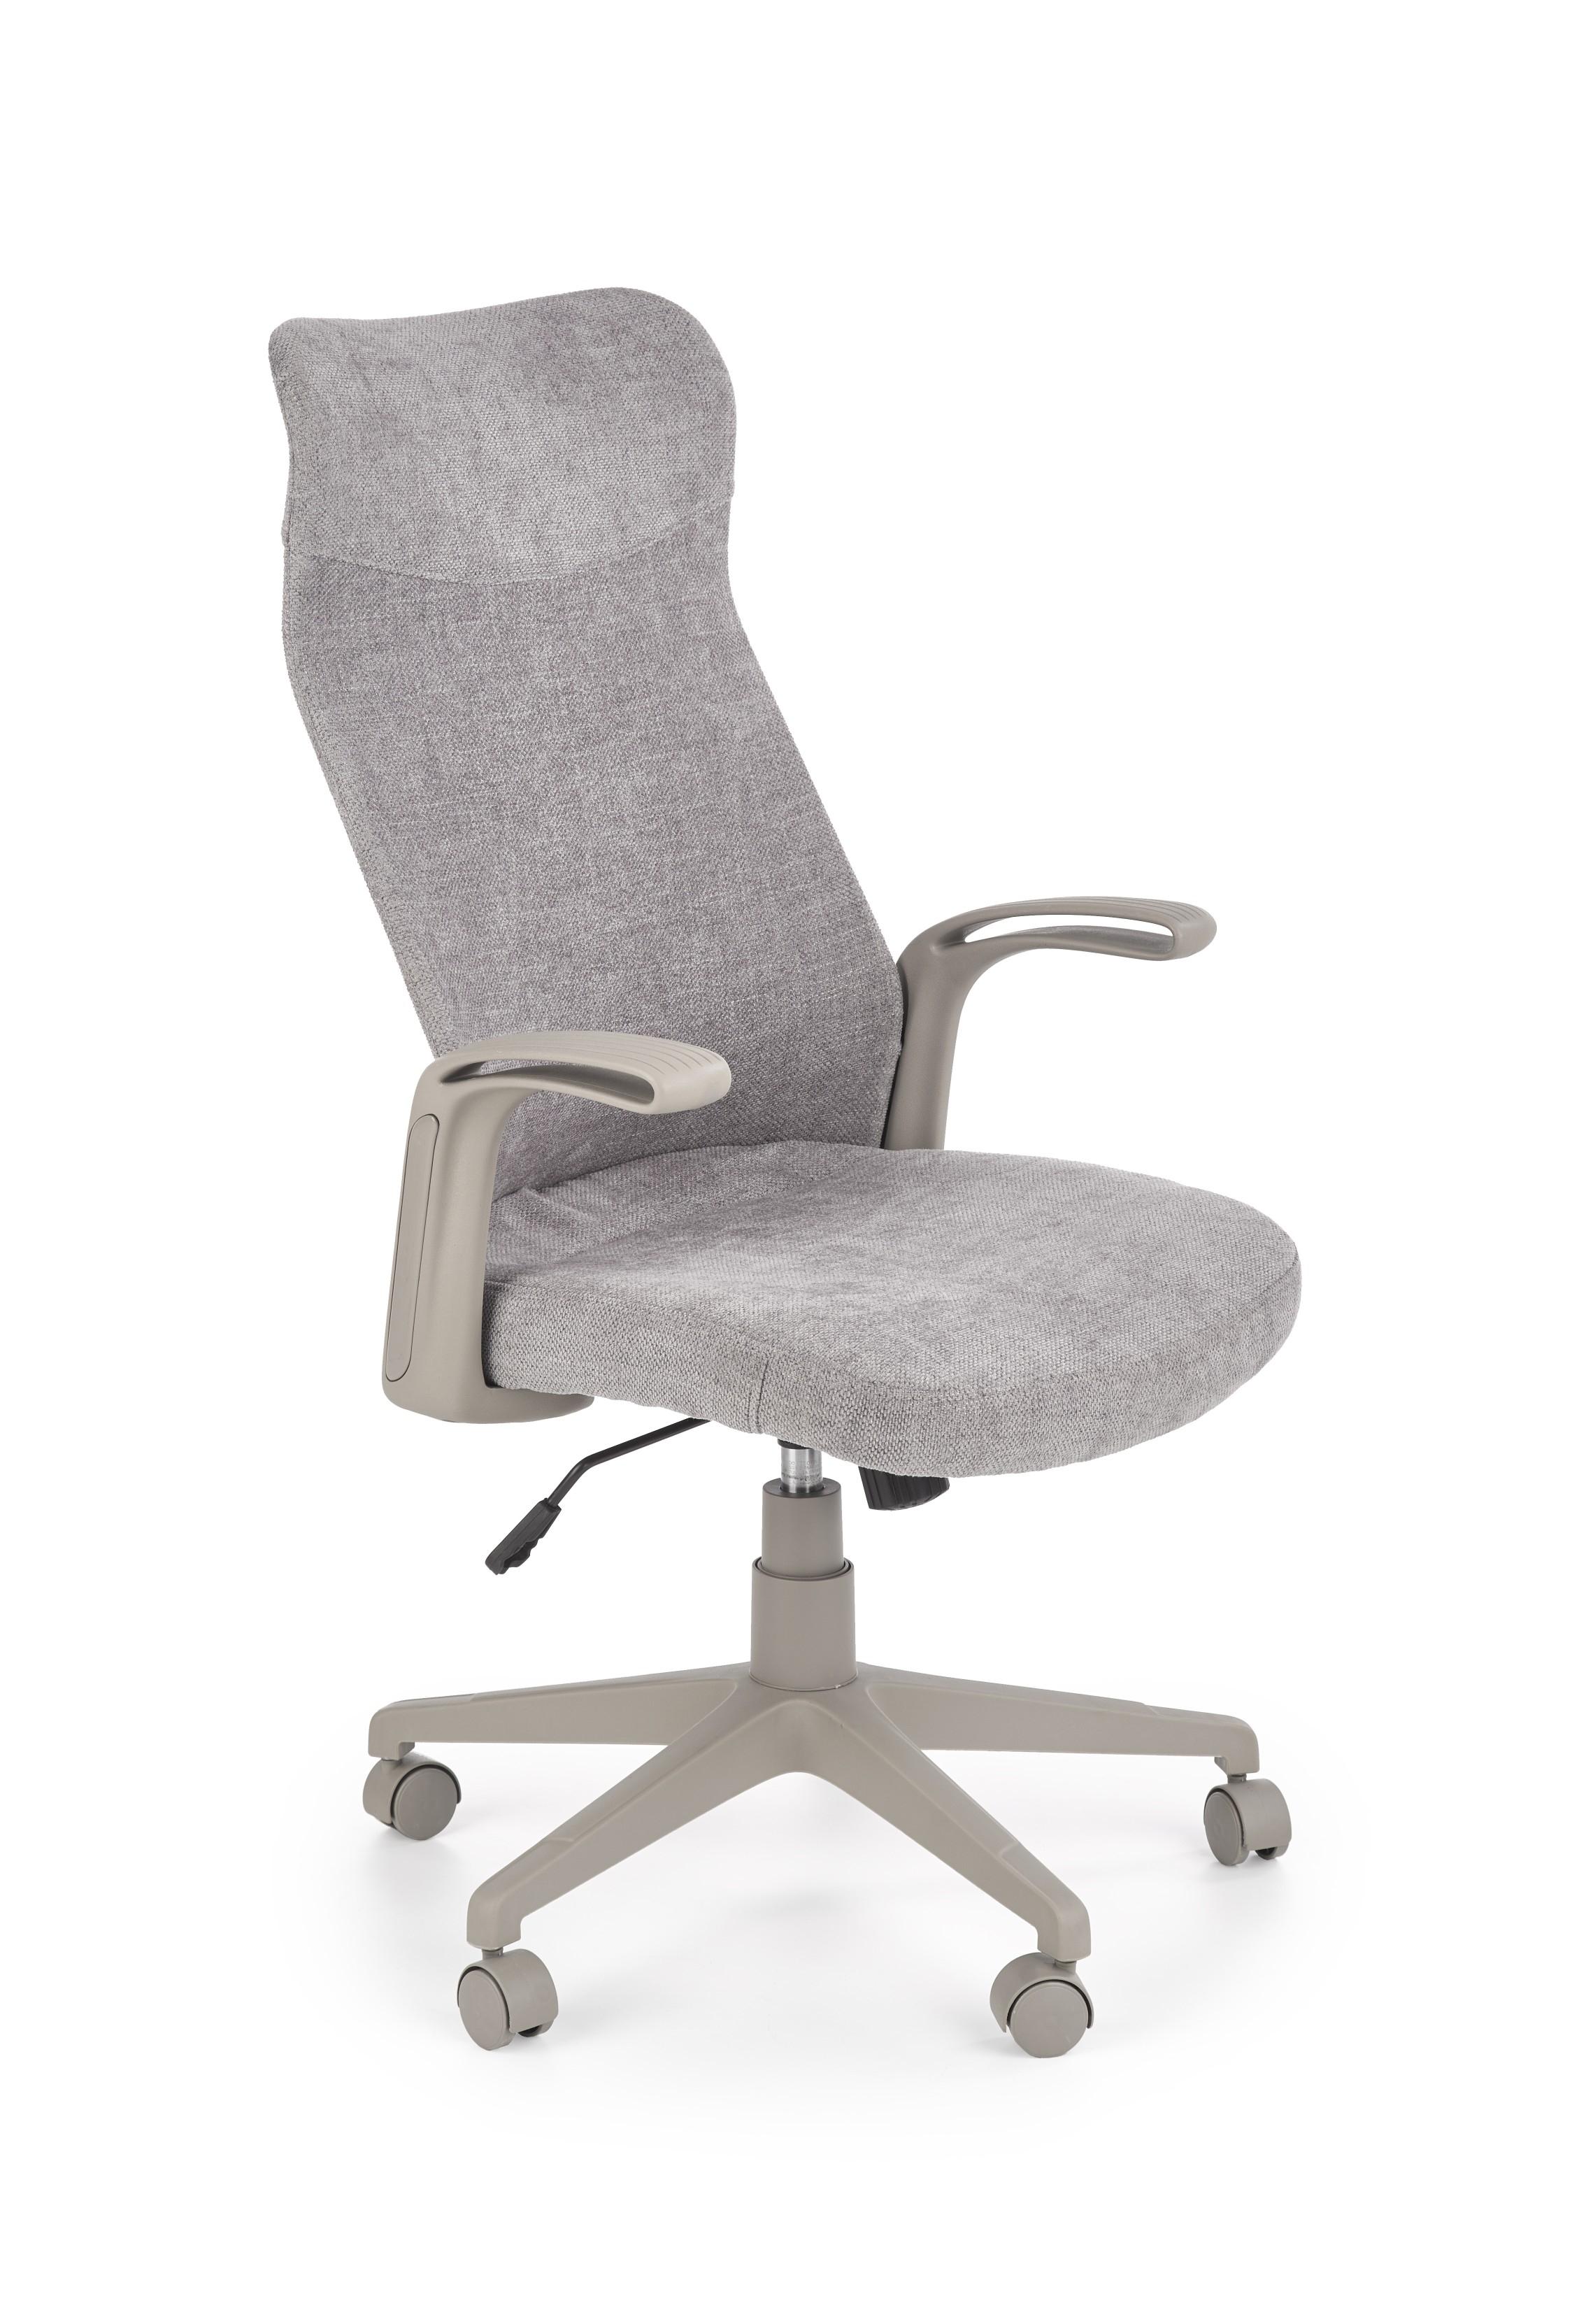 Scaun de birou ergonomic tapitat cu stofa Arctic Gri deschis / Gri, l62xA62xH62-110 cm